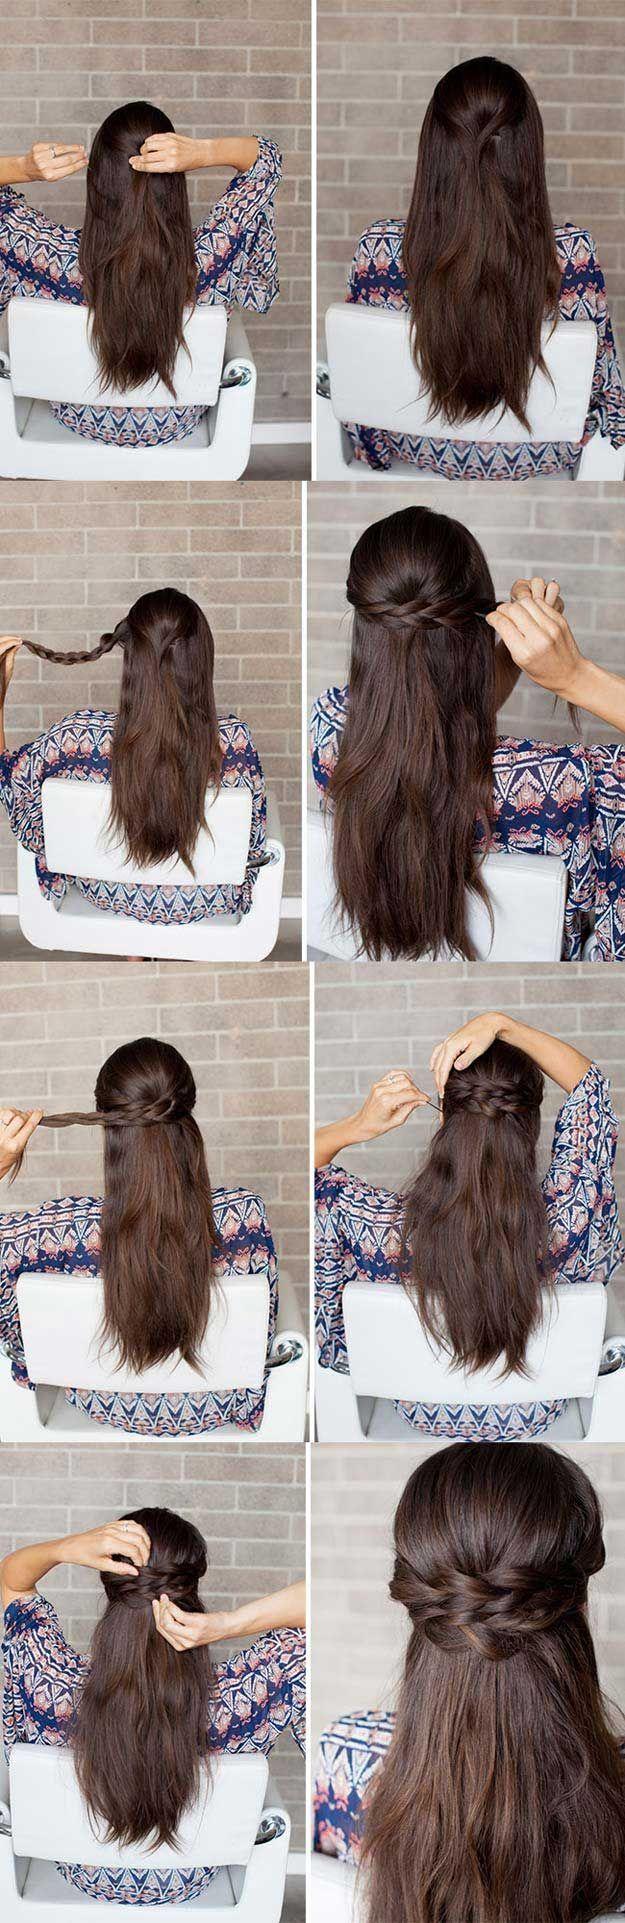 2018 Halb hoch halb runter Frisuren für langes Haar #hairideas